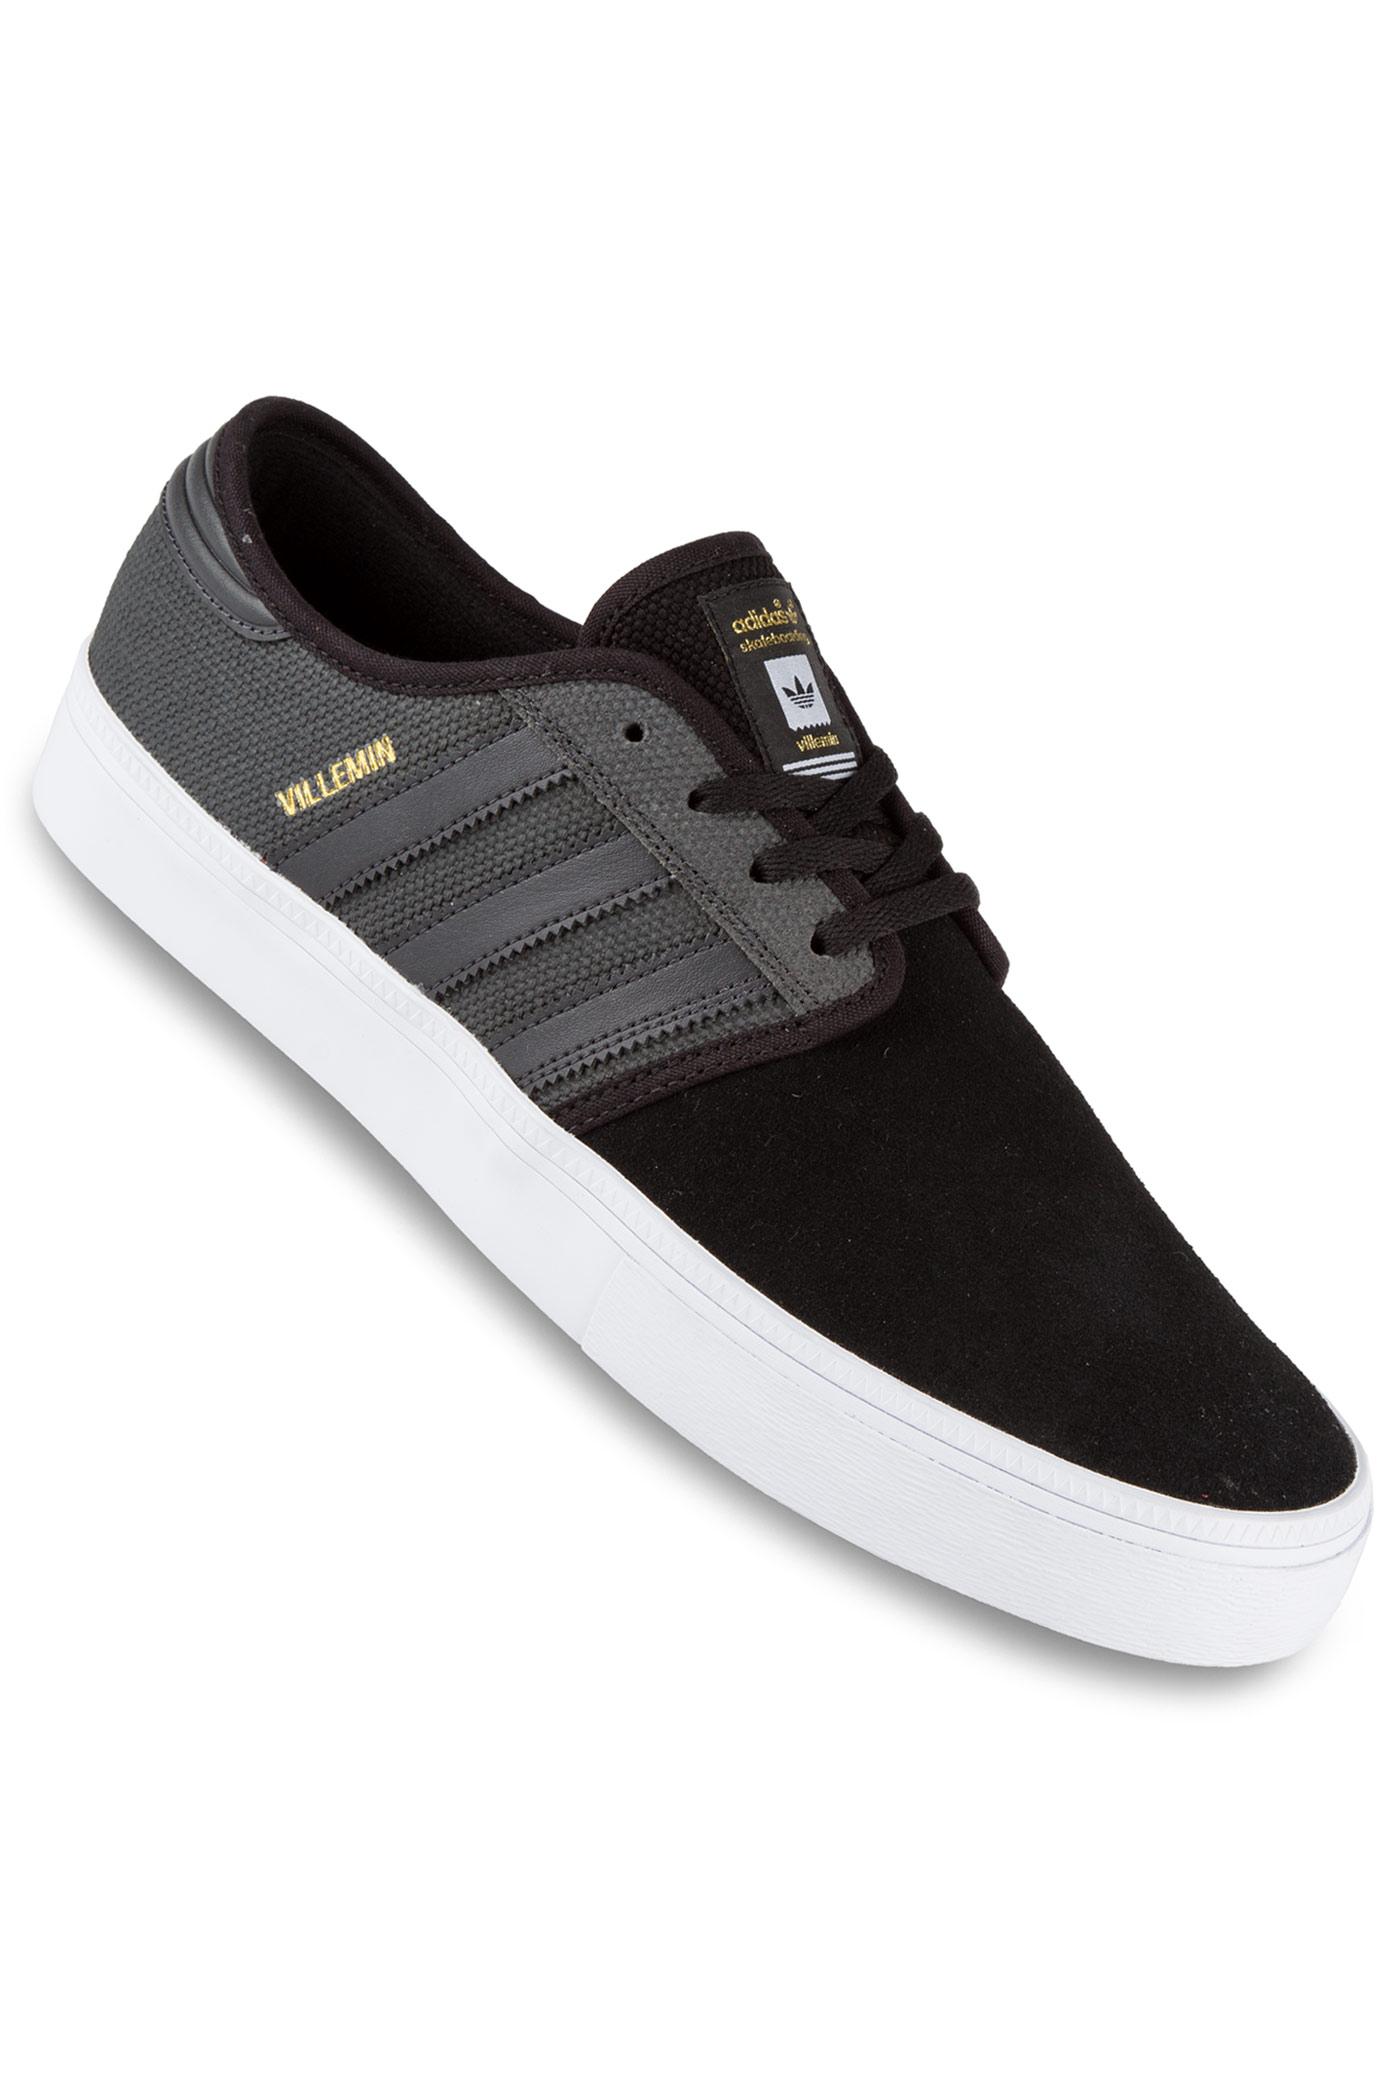 adidas seeley adv shoes grey grey black buy at skatedeluxe